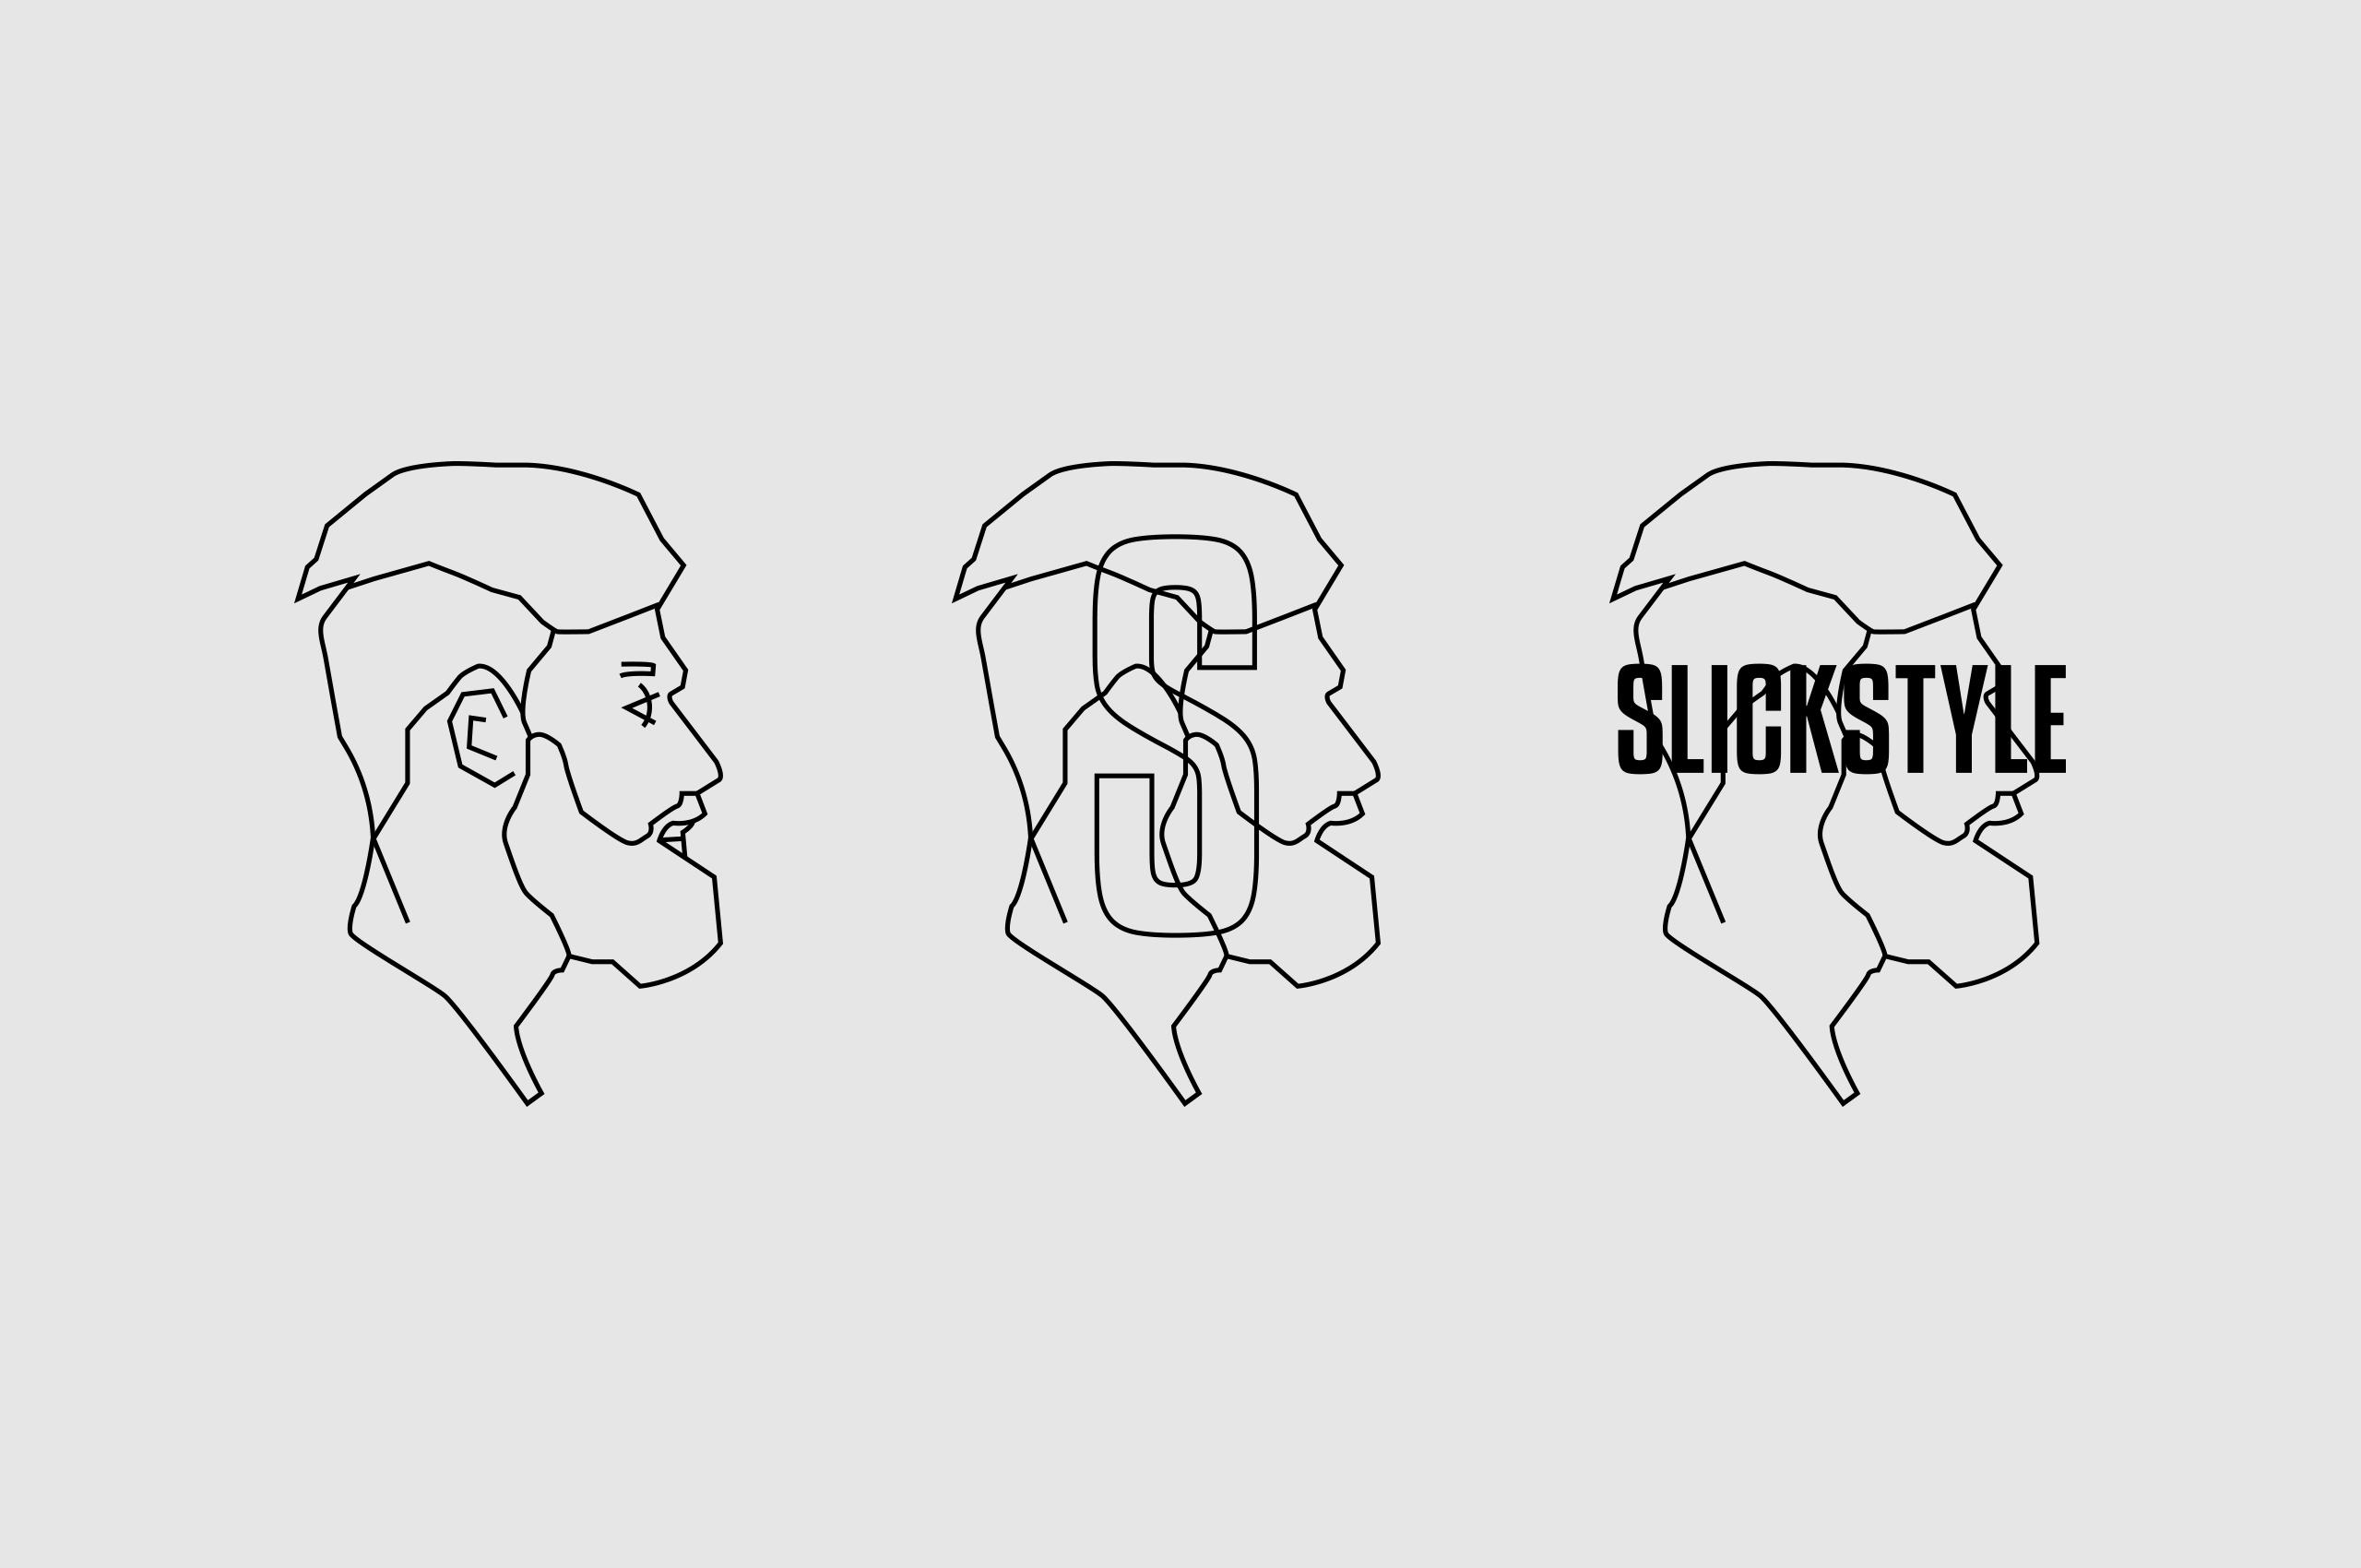 SLICKSTYLE-10a